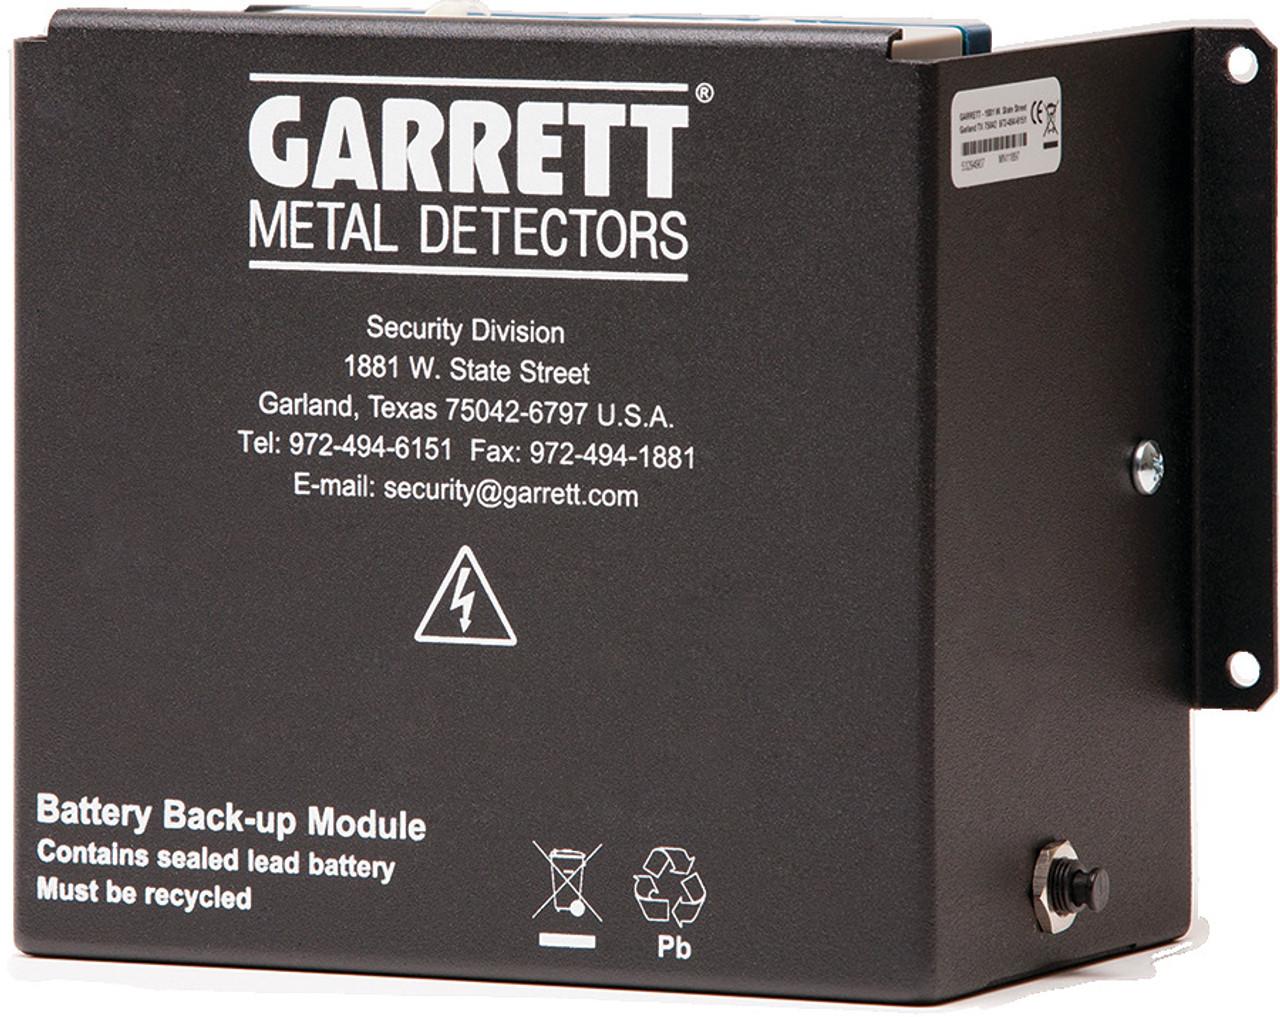 Garrett PD 6500i Mobile Walk-Through Metal Detector - Battery Modules